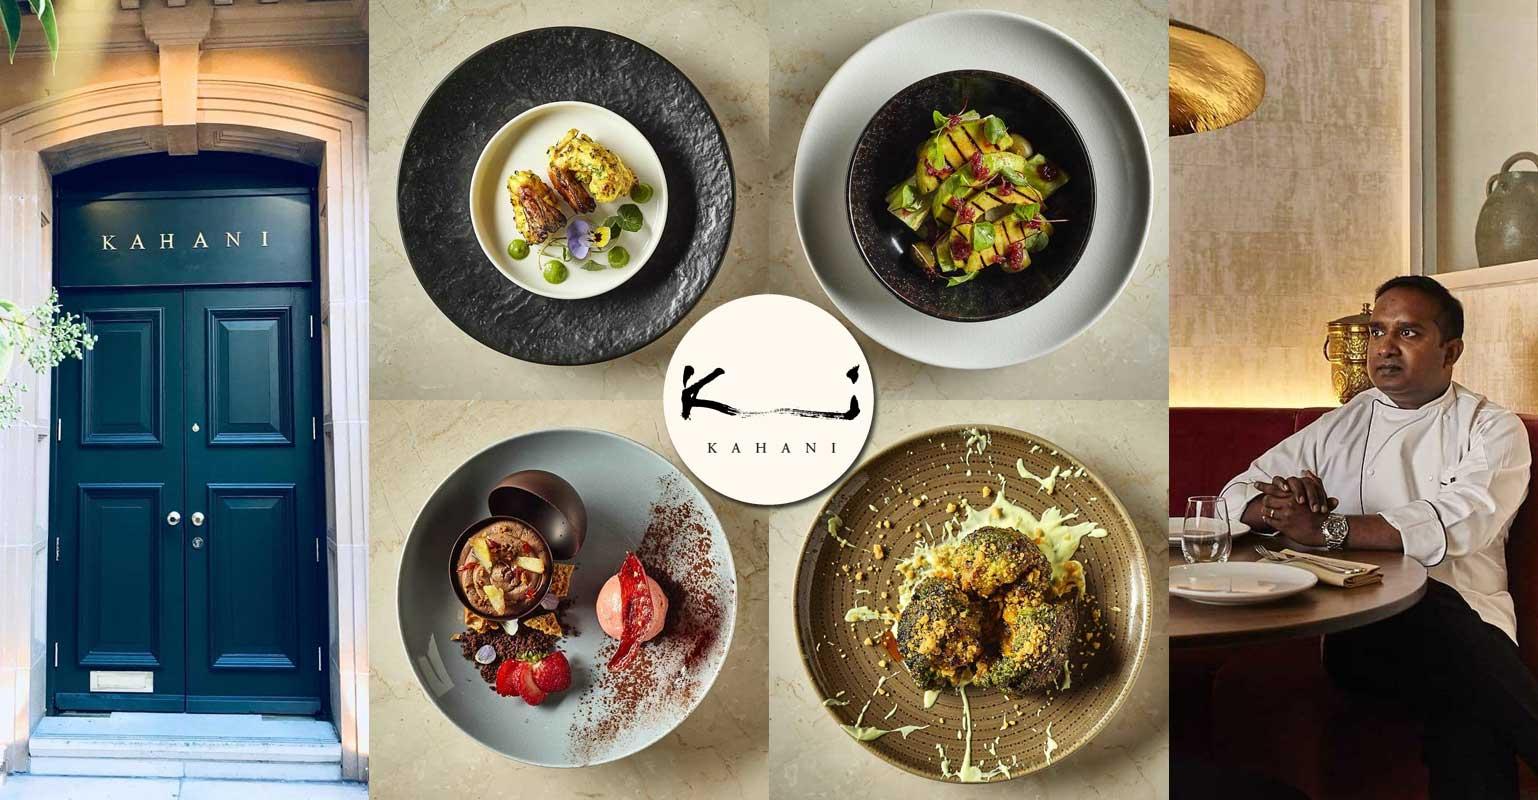 New Peter S Kitchen Menu